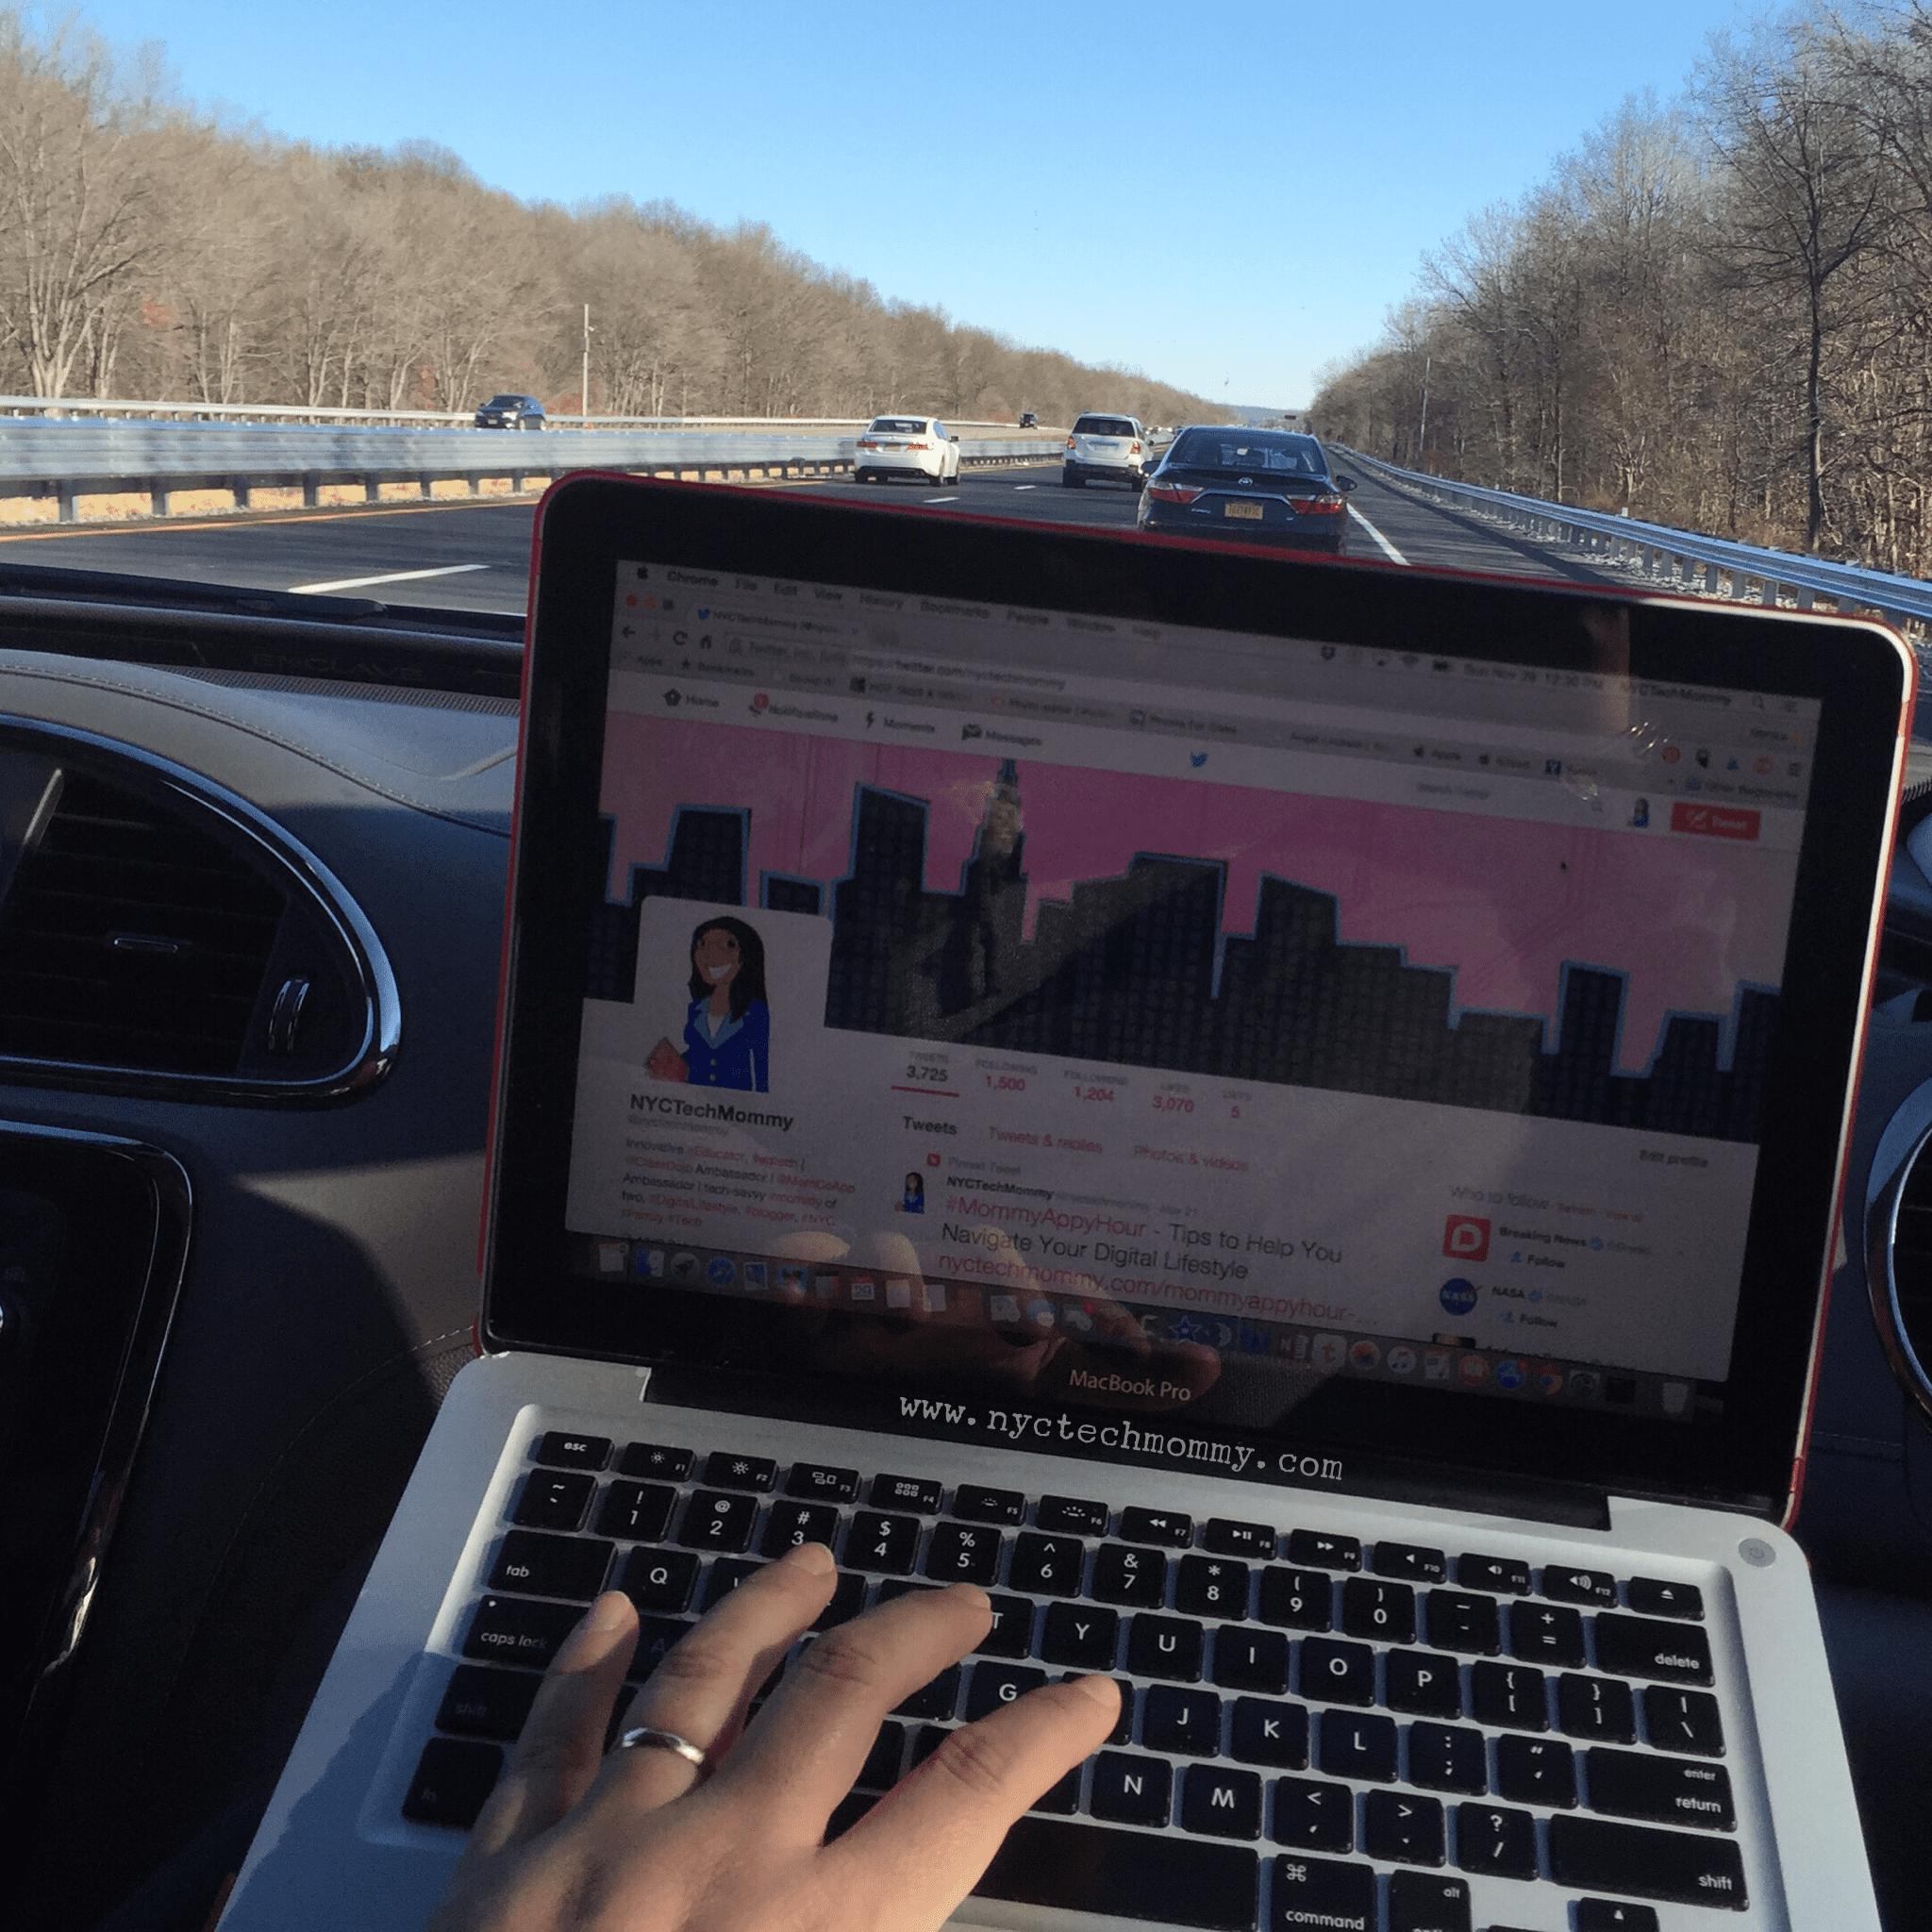 Buick Enclave Wifi Hotspot